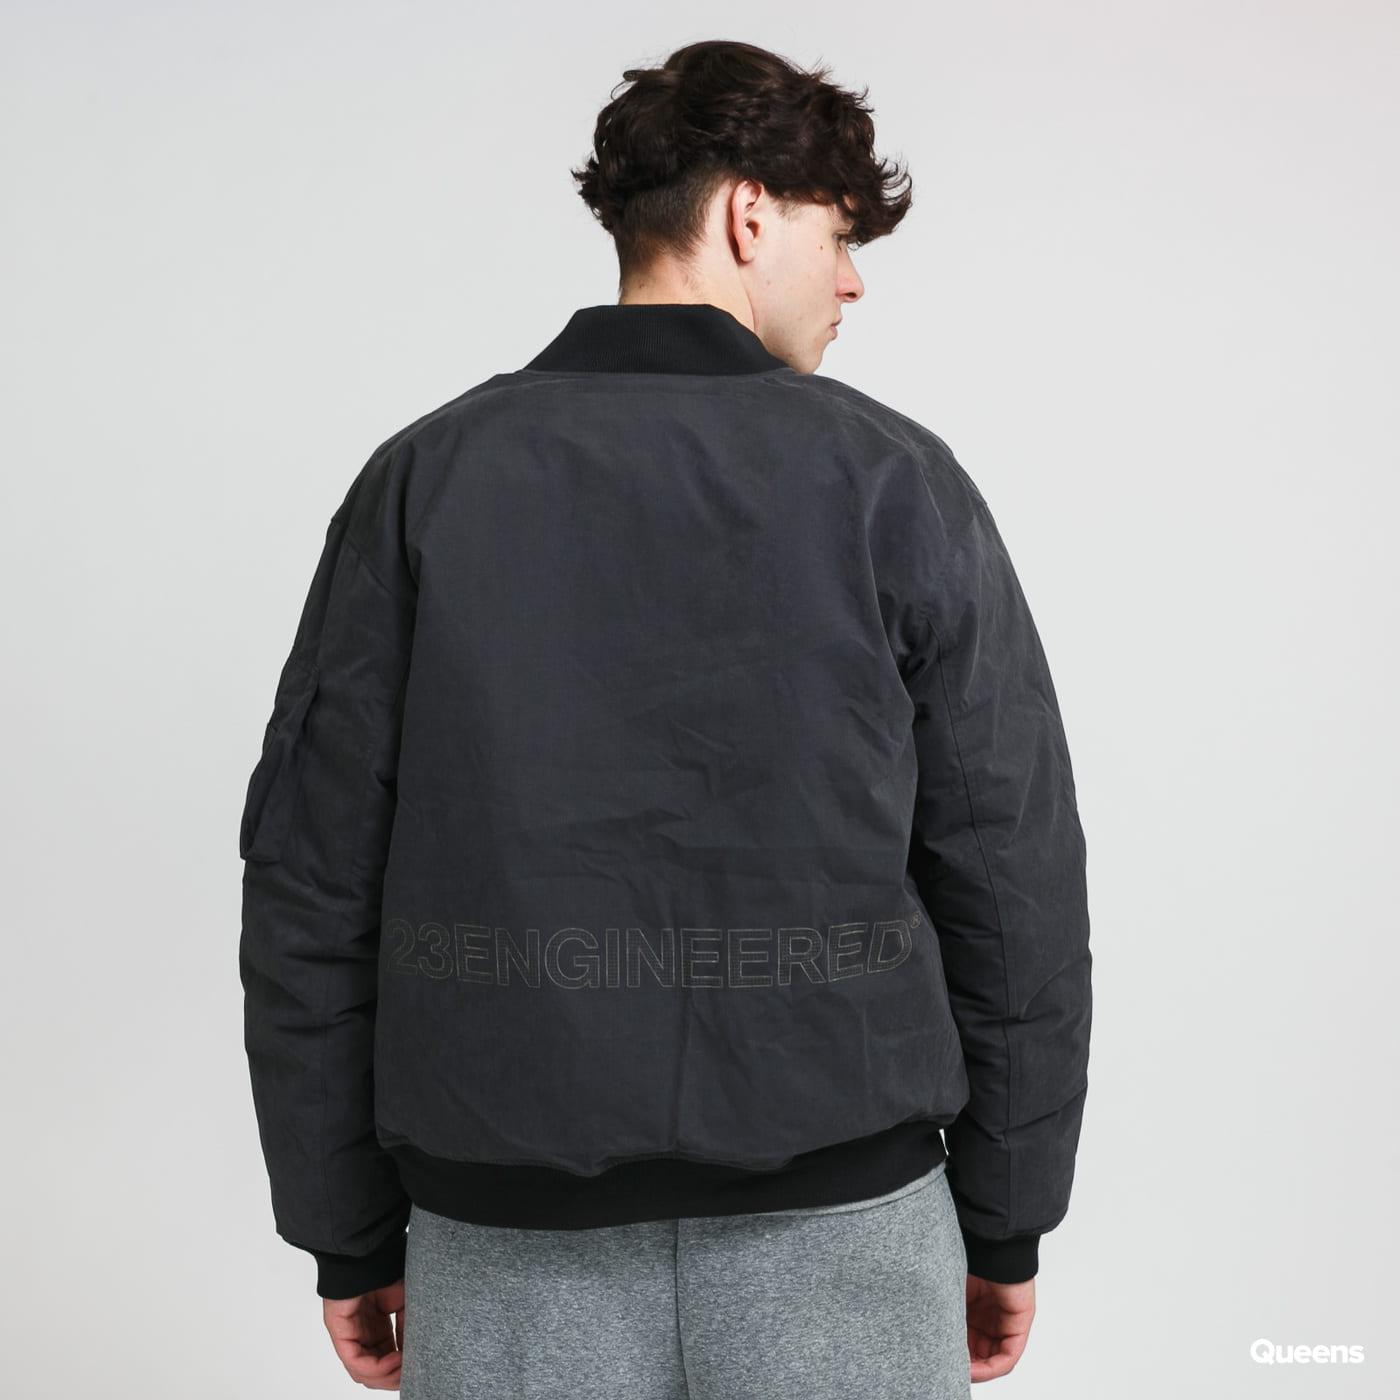 Jordan M J 23Engineered MA1 Down Jacket black